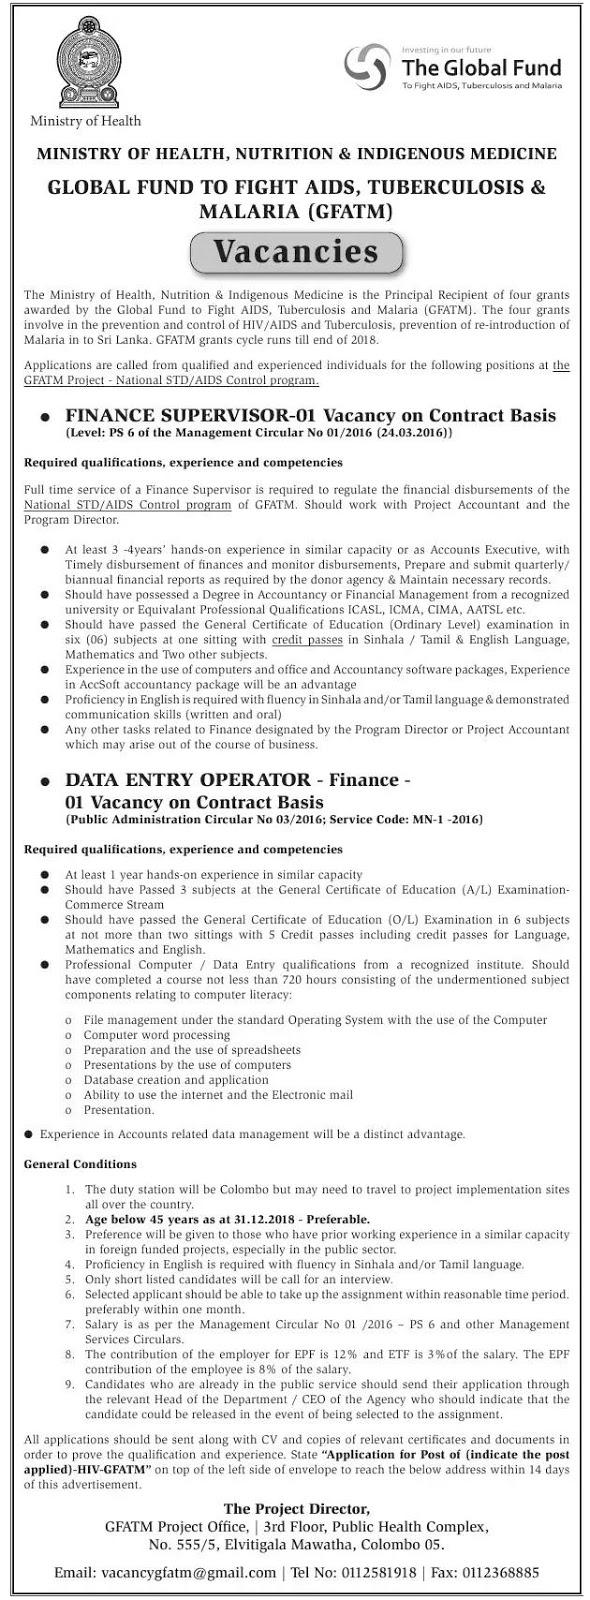 application for data entry operator